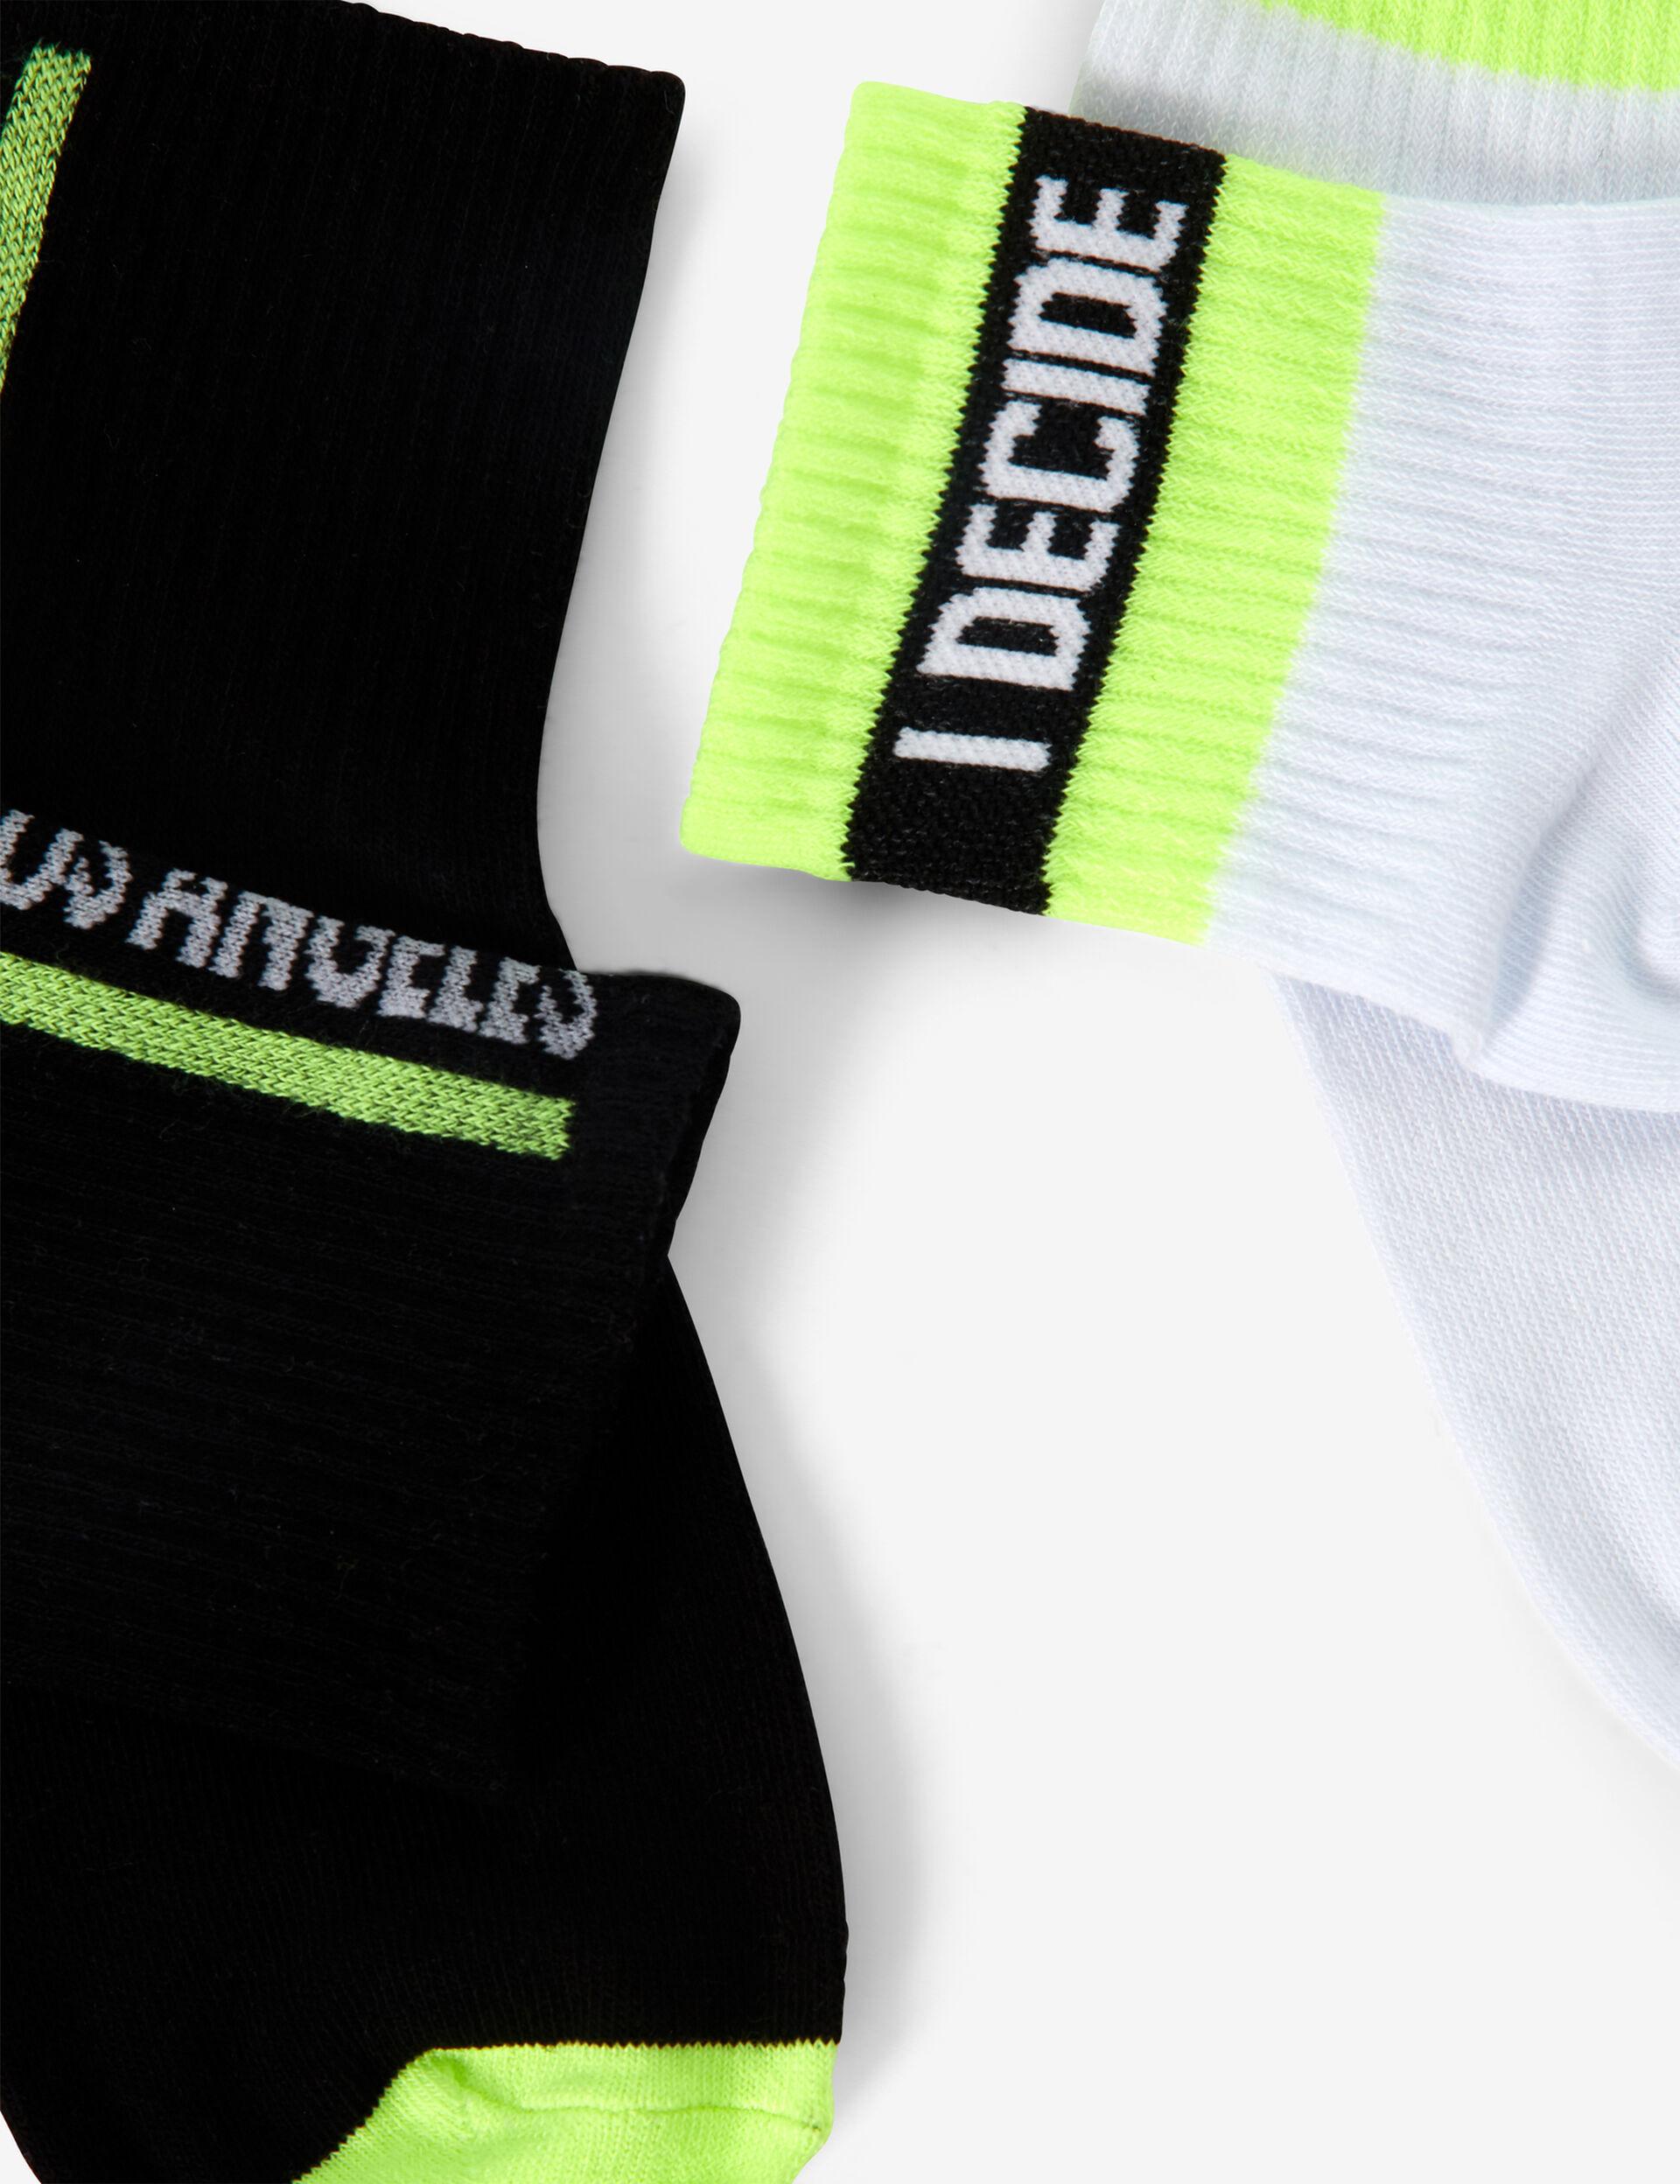 Slogan socks